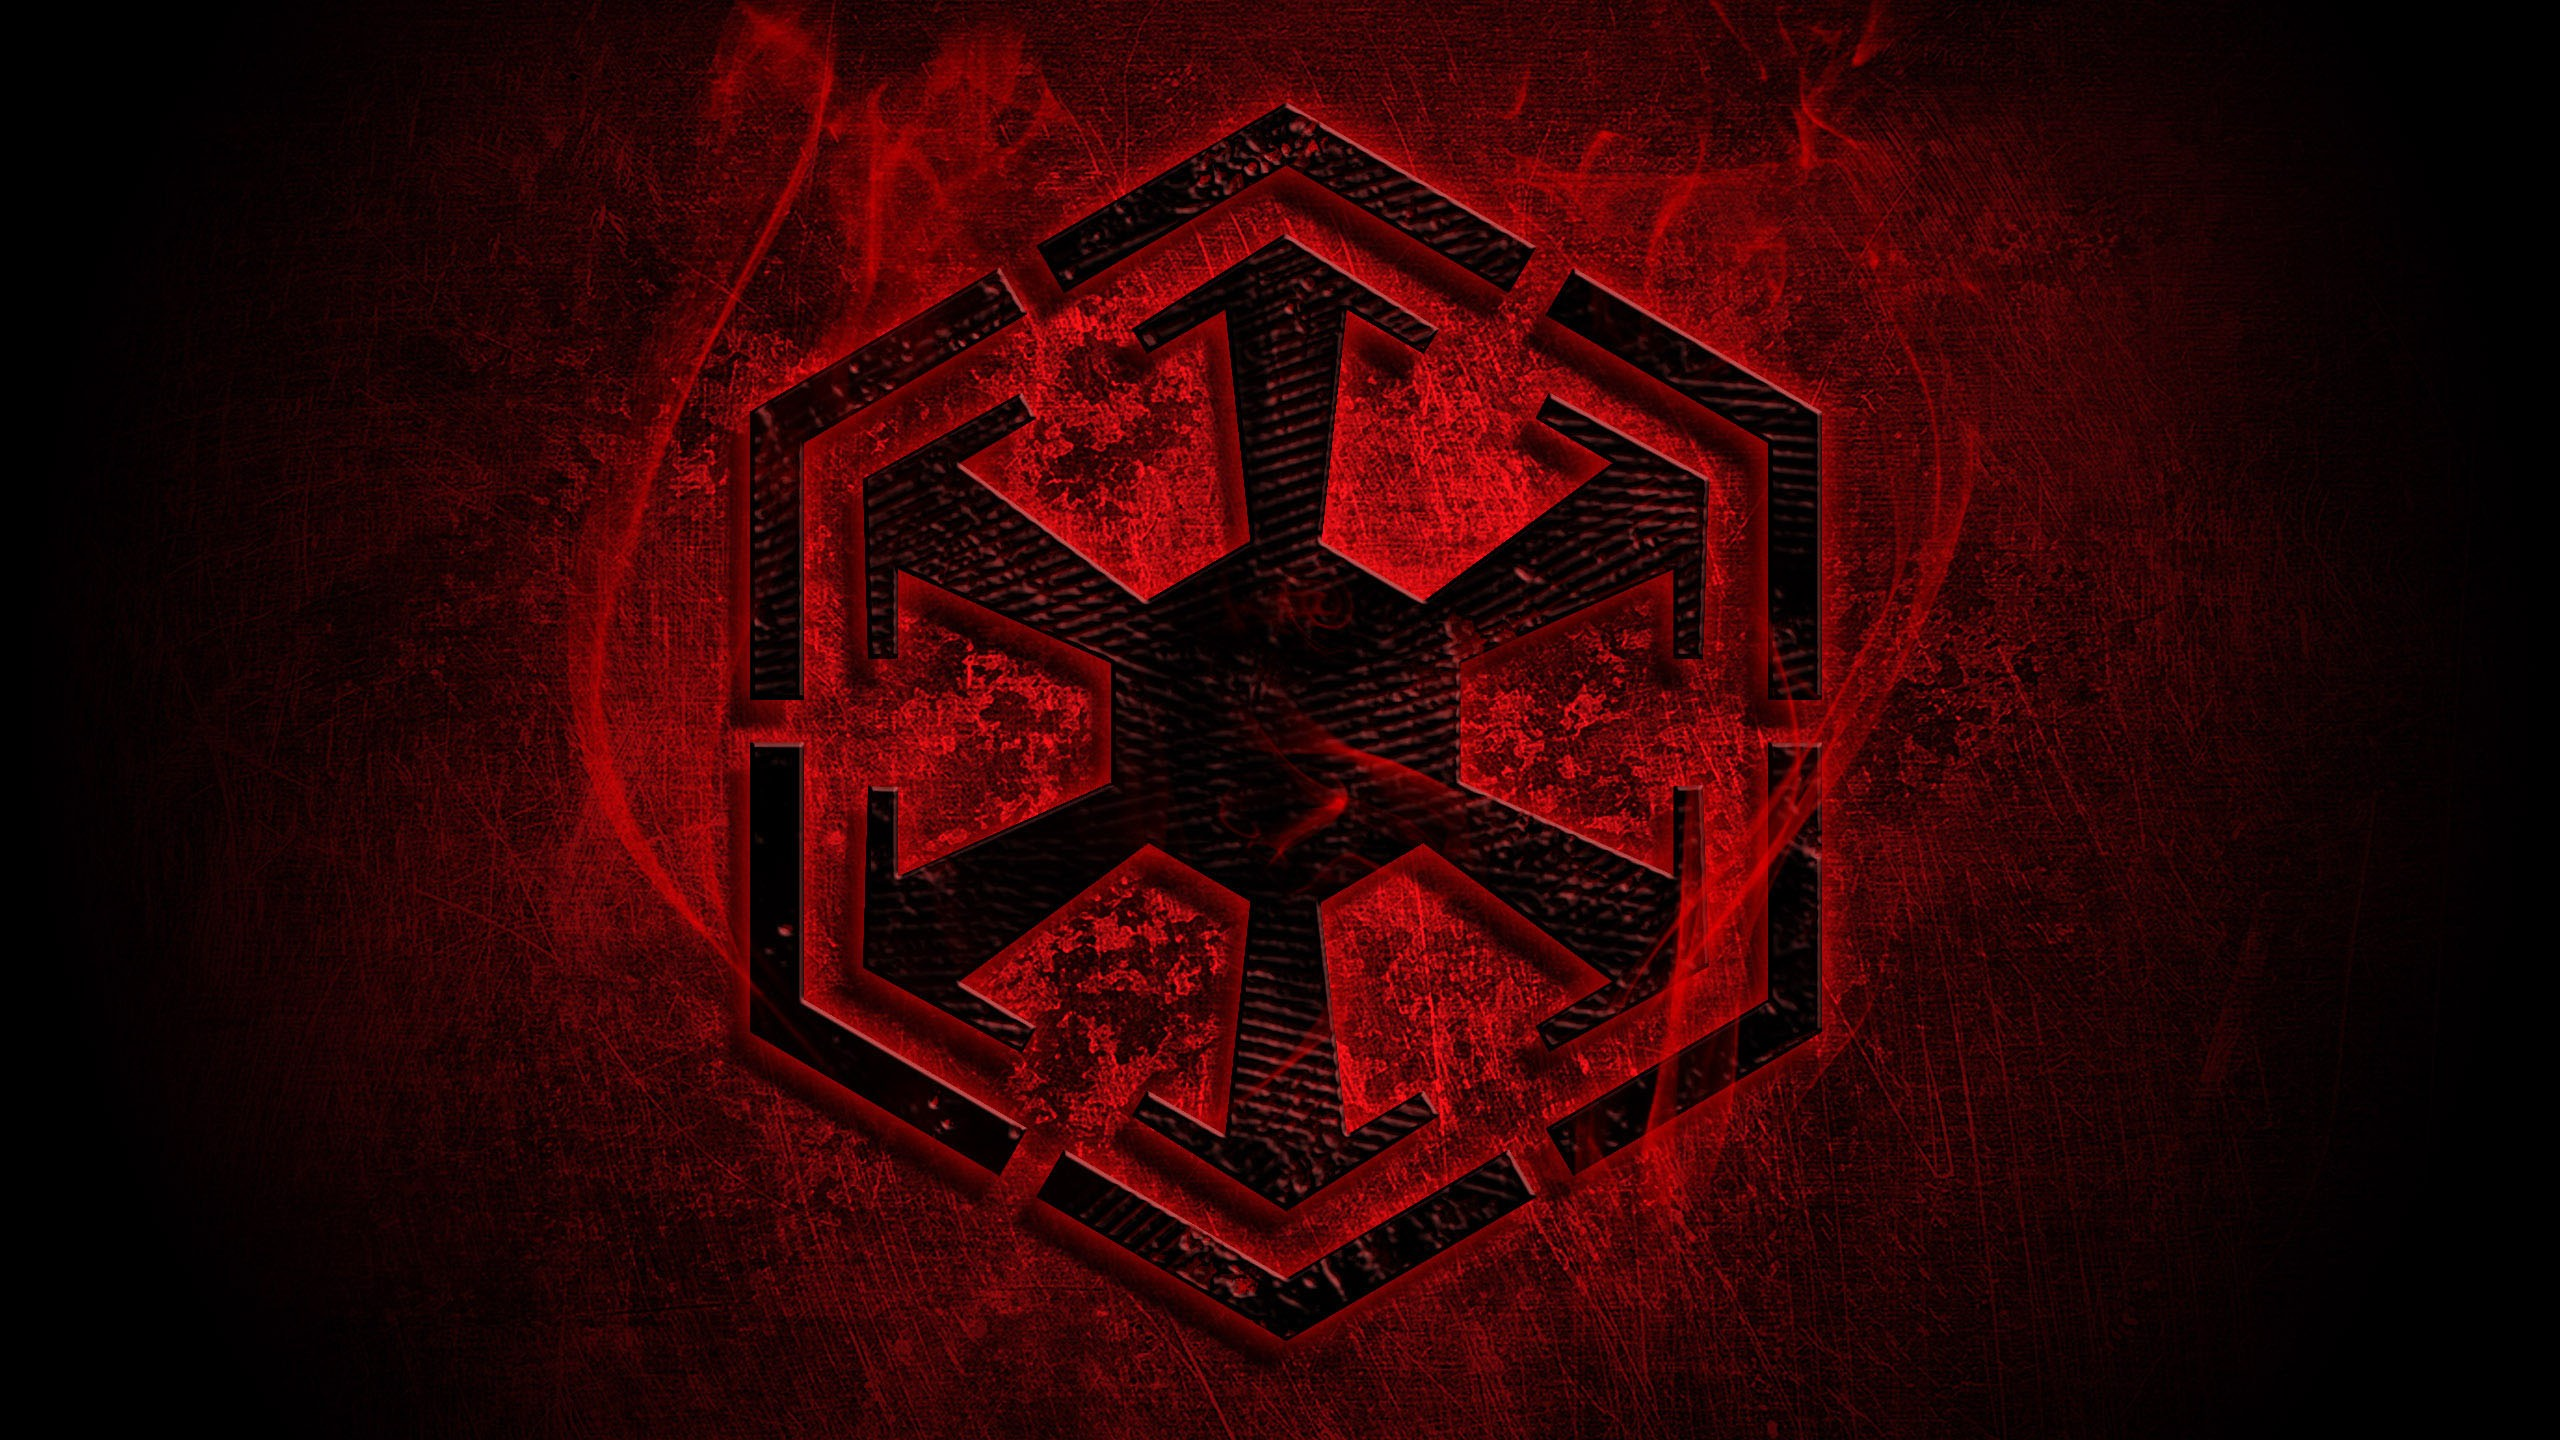 Anakin Skywalker Sheev Palpatine Mace Windu red darkness computer wallpaper